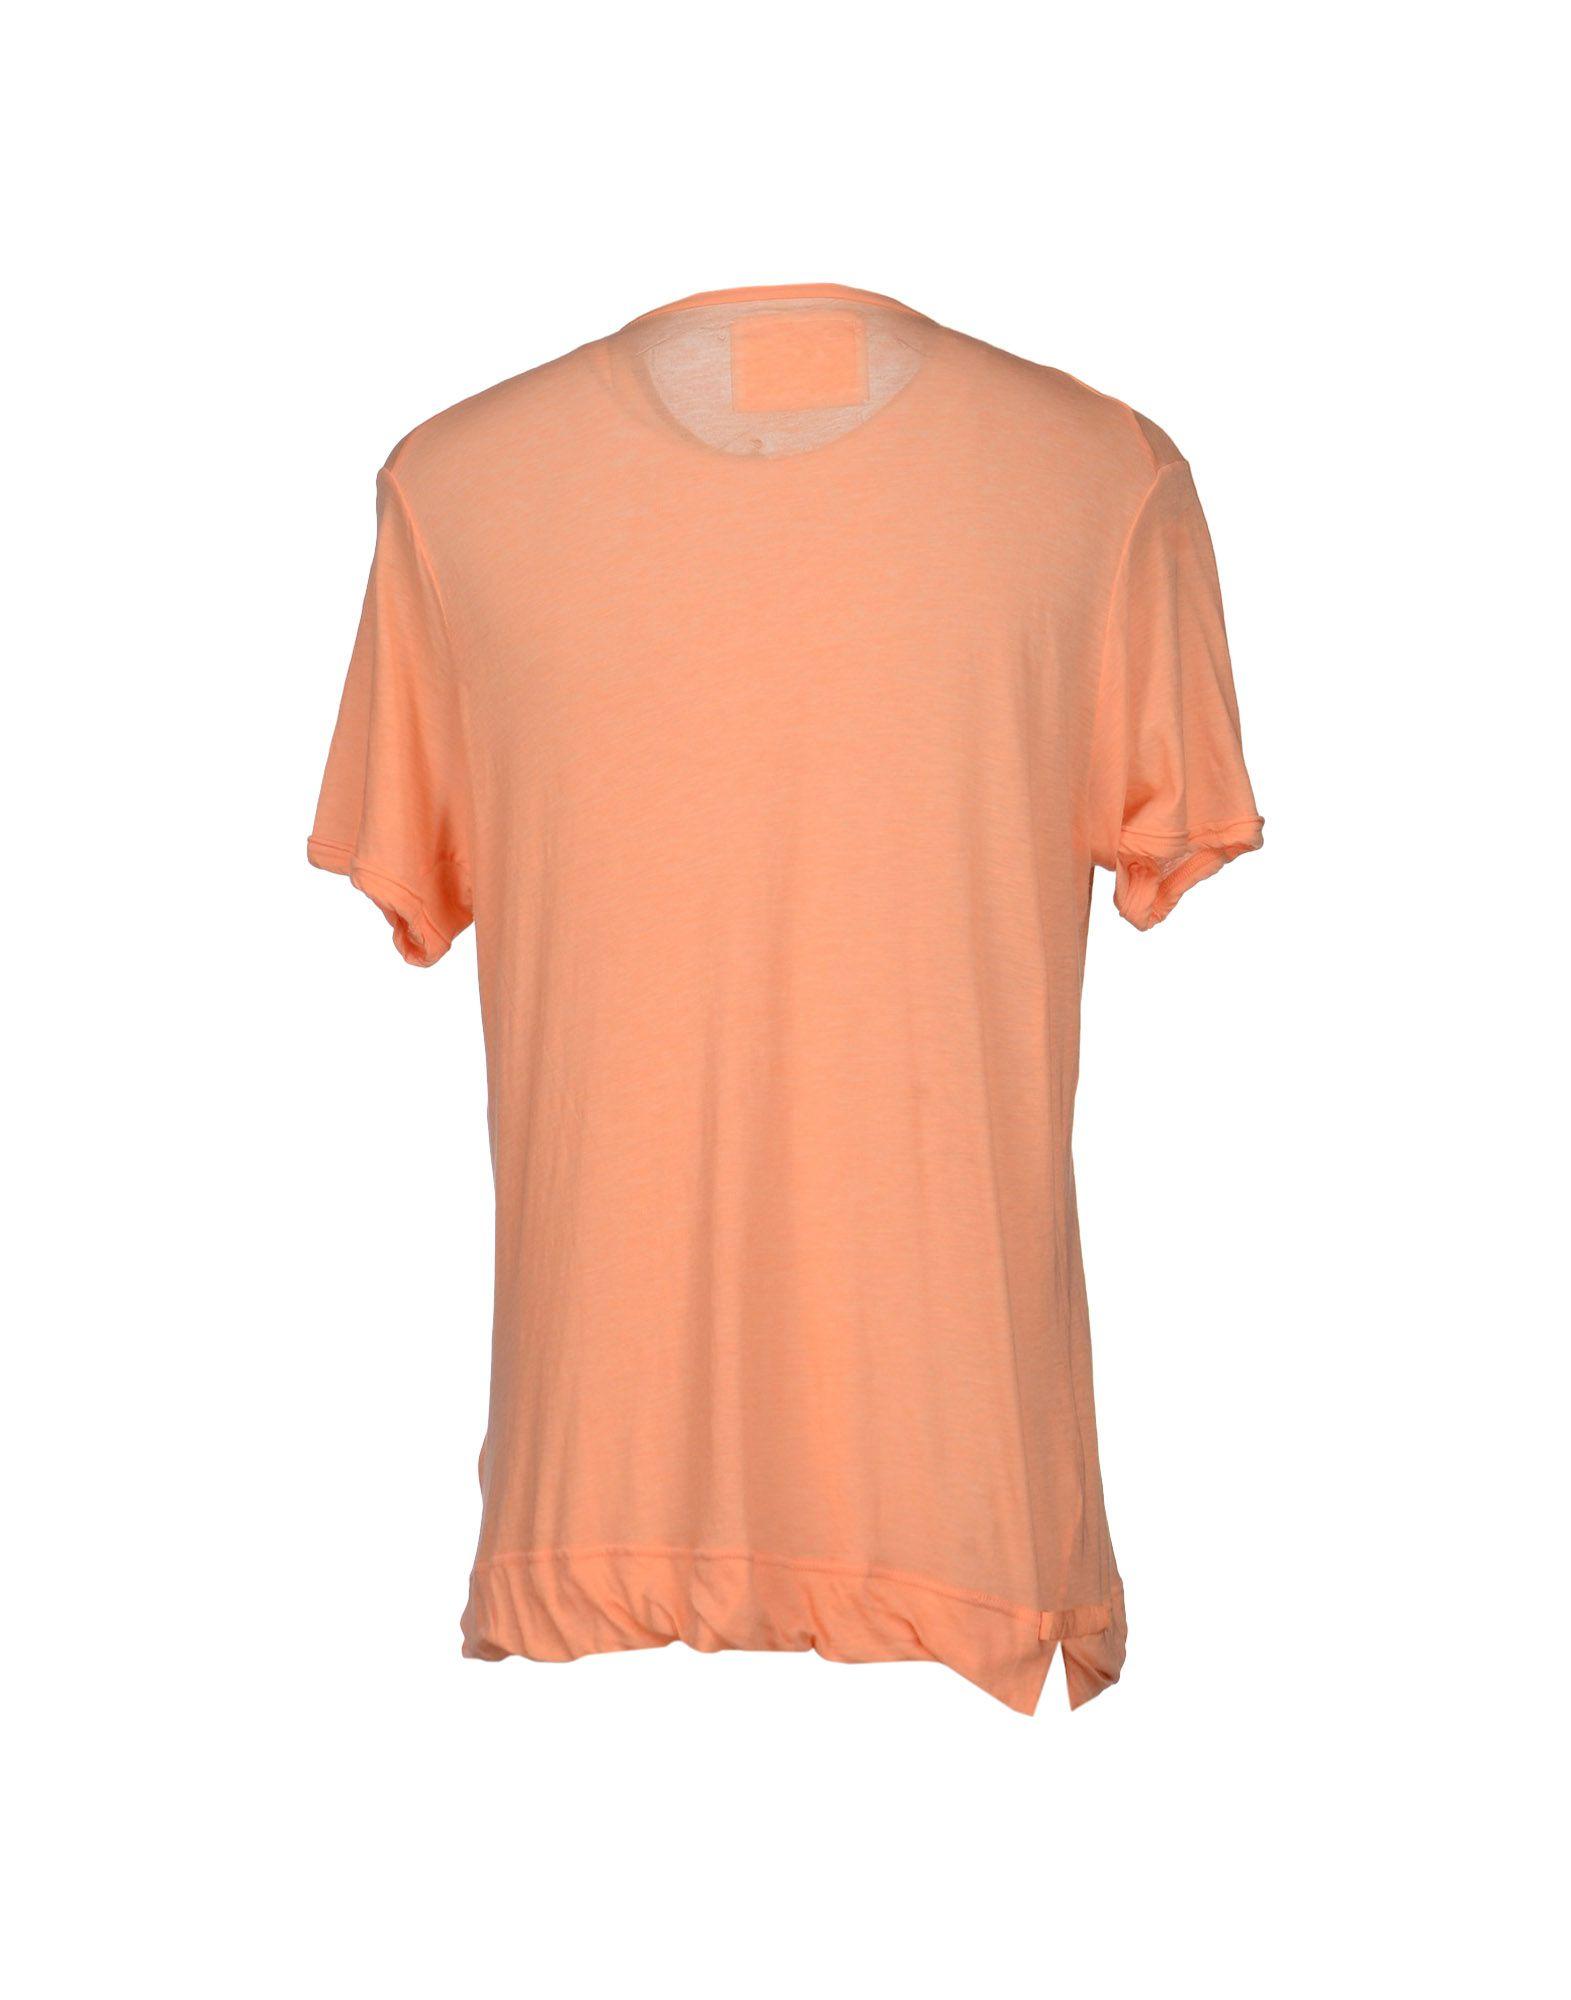 V room clothing online